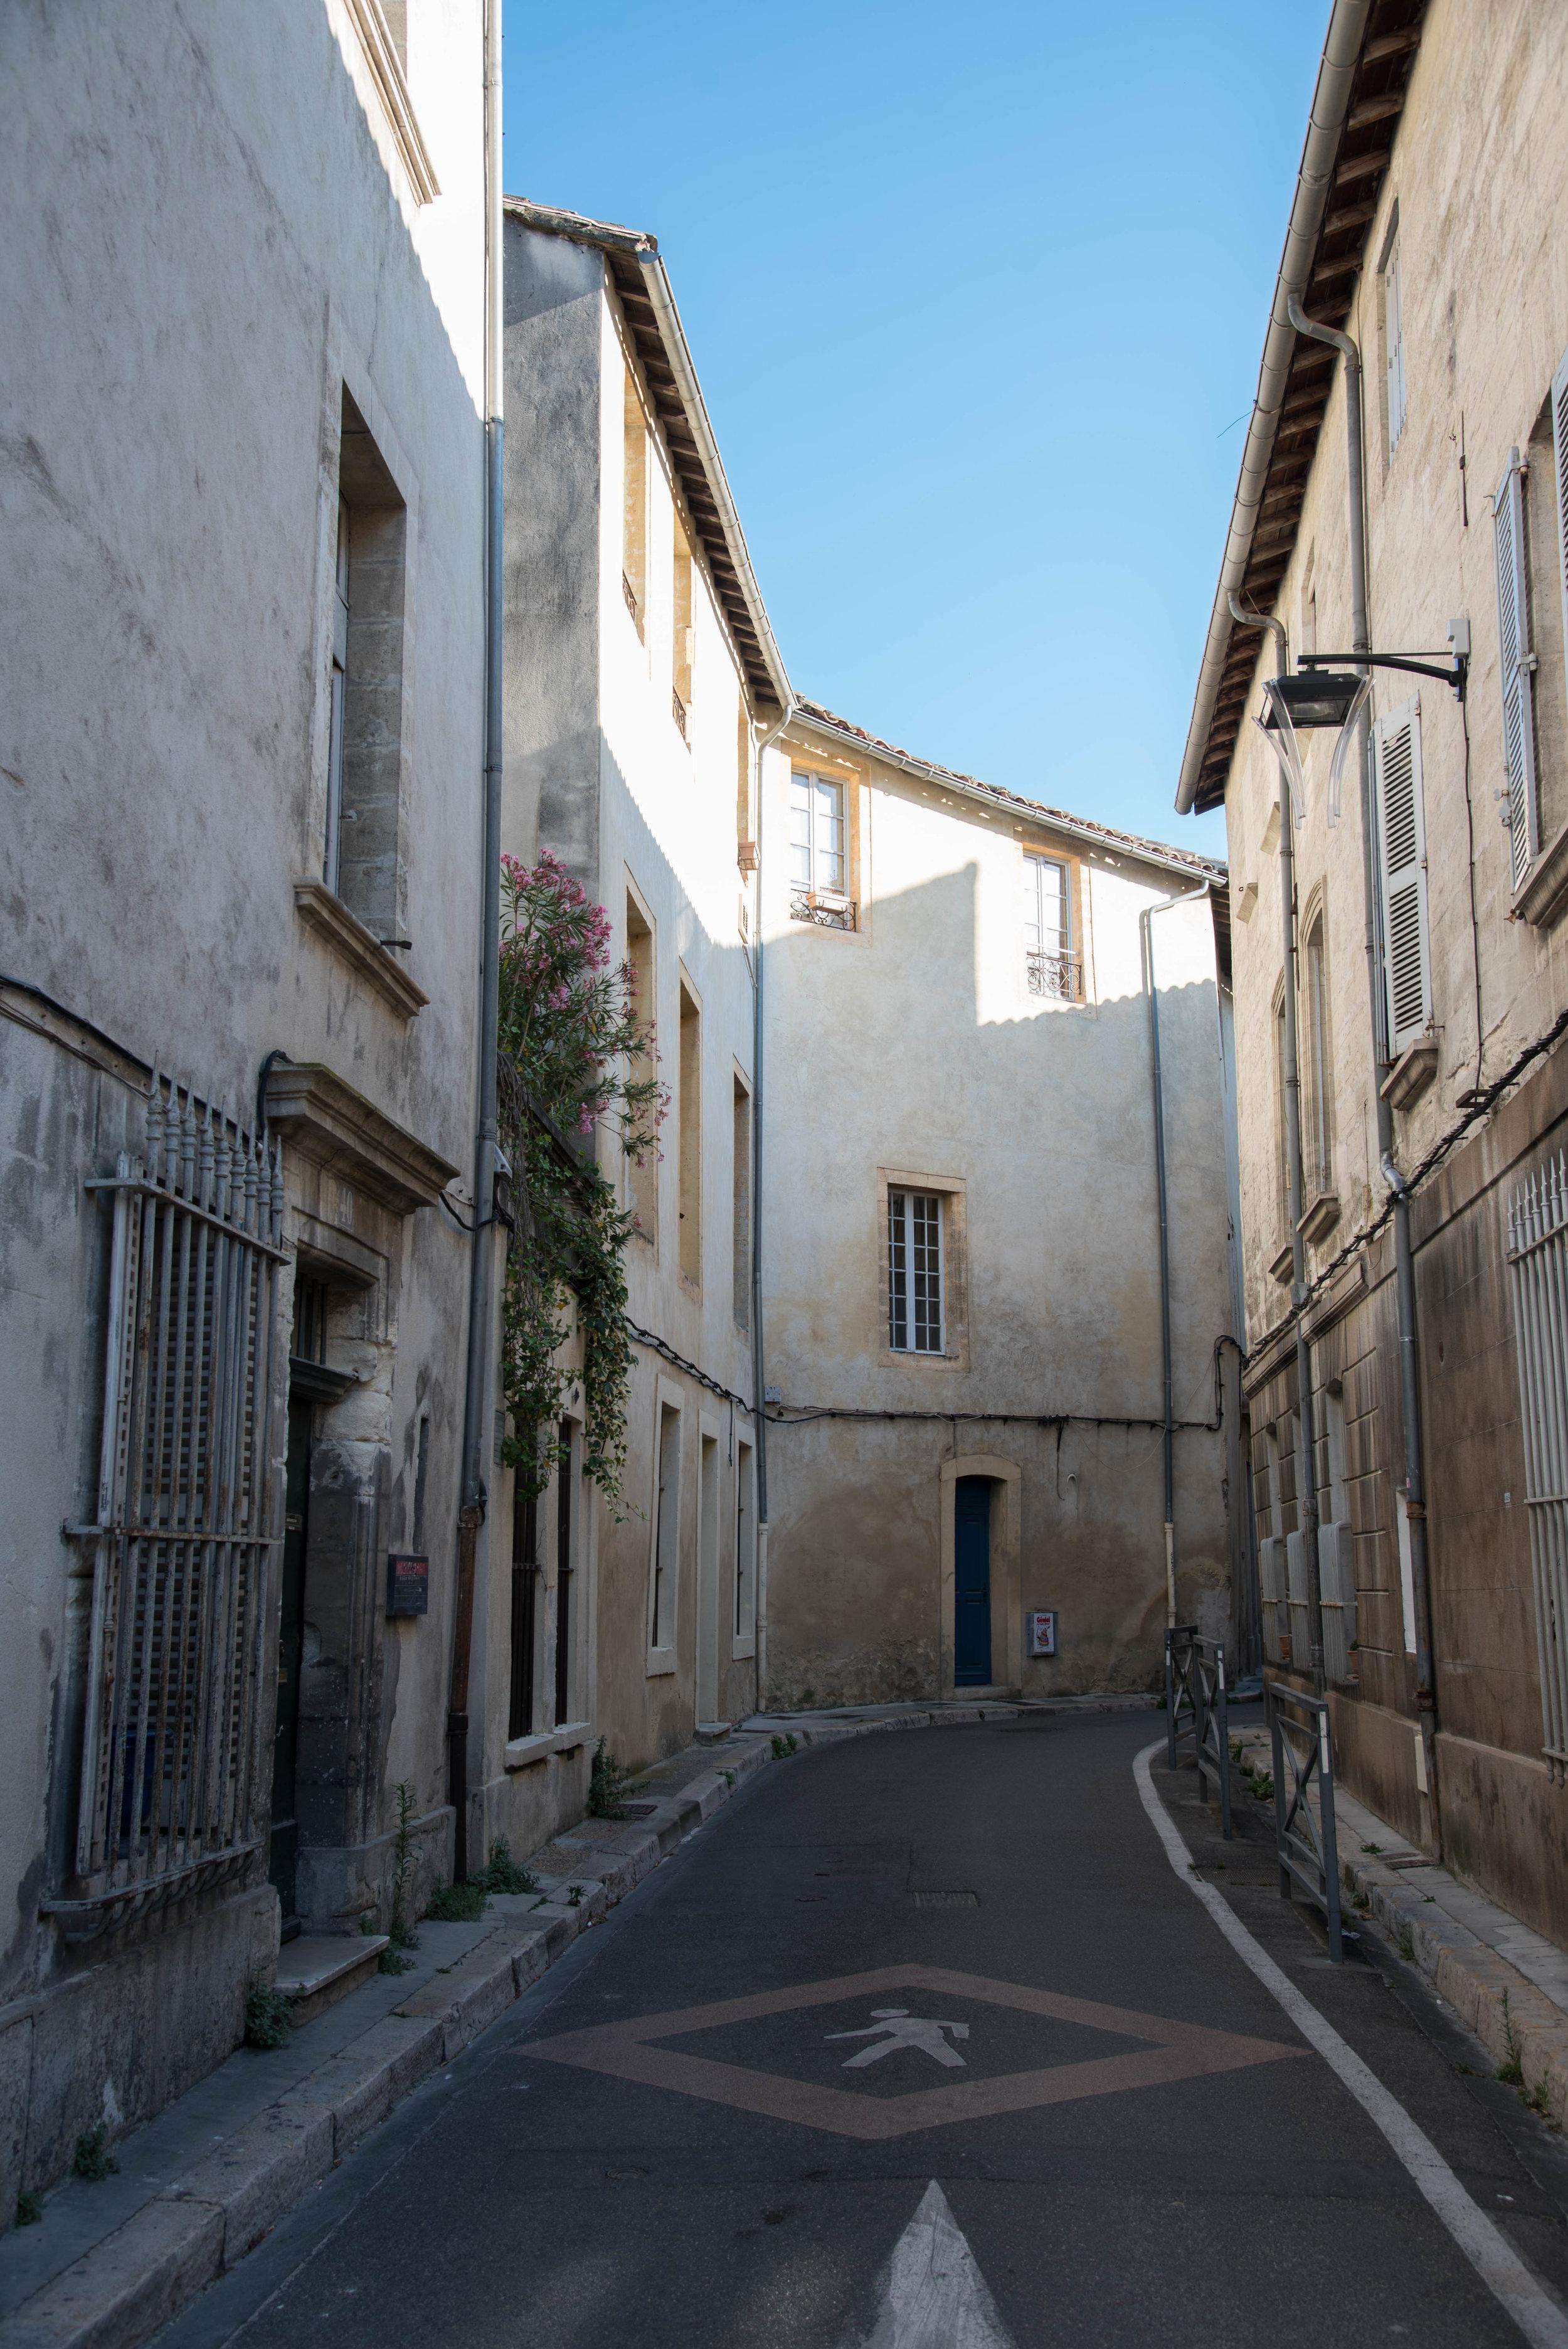 ROSE & IVY Journal R&I Travels Escape to Avignon